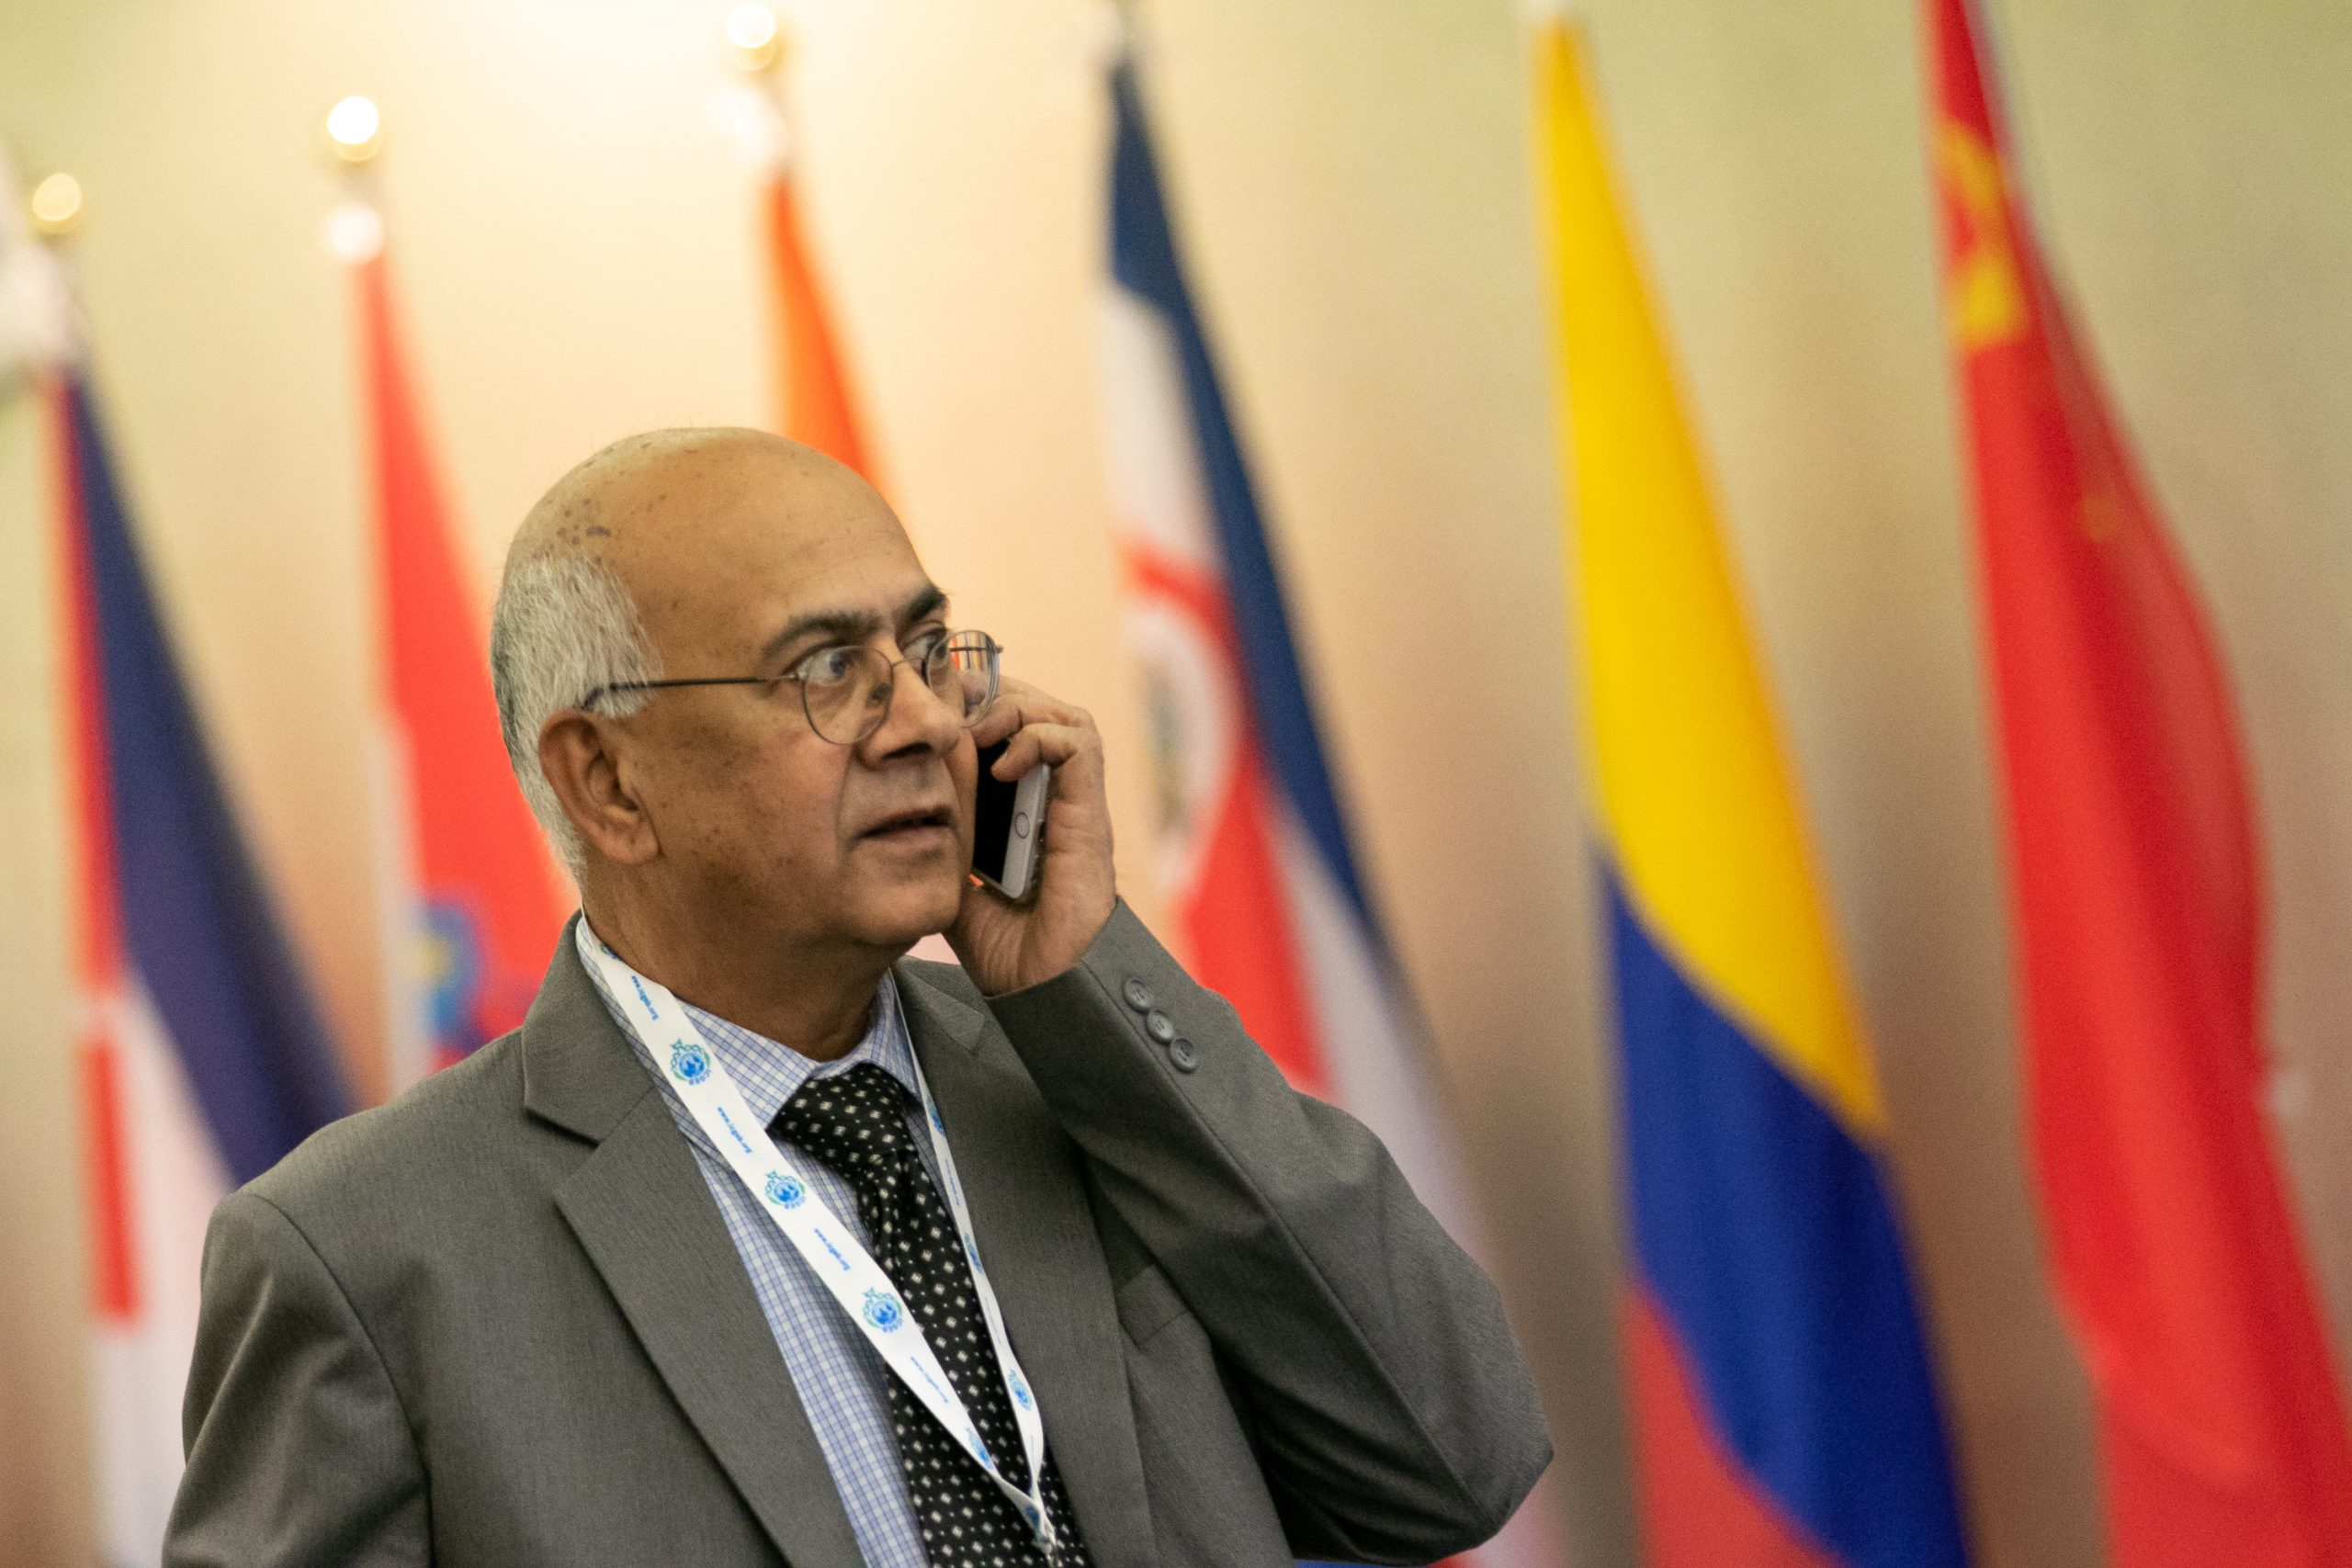 Dr. Dinakar Salunke, Director, ICGEB New Delhi